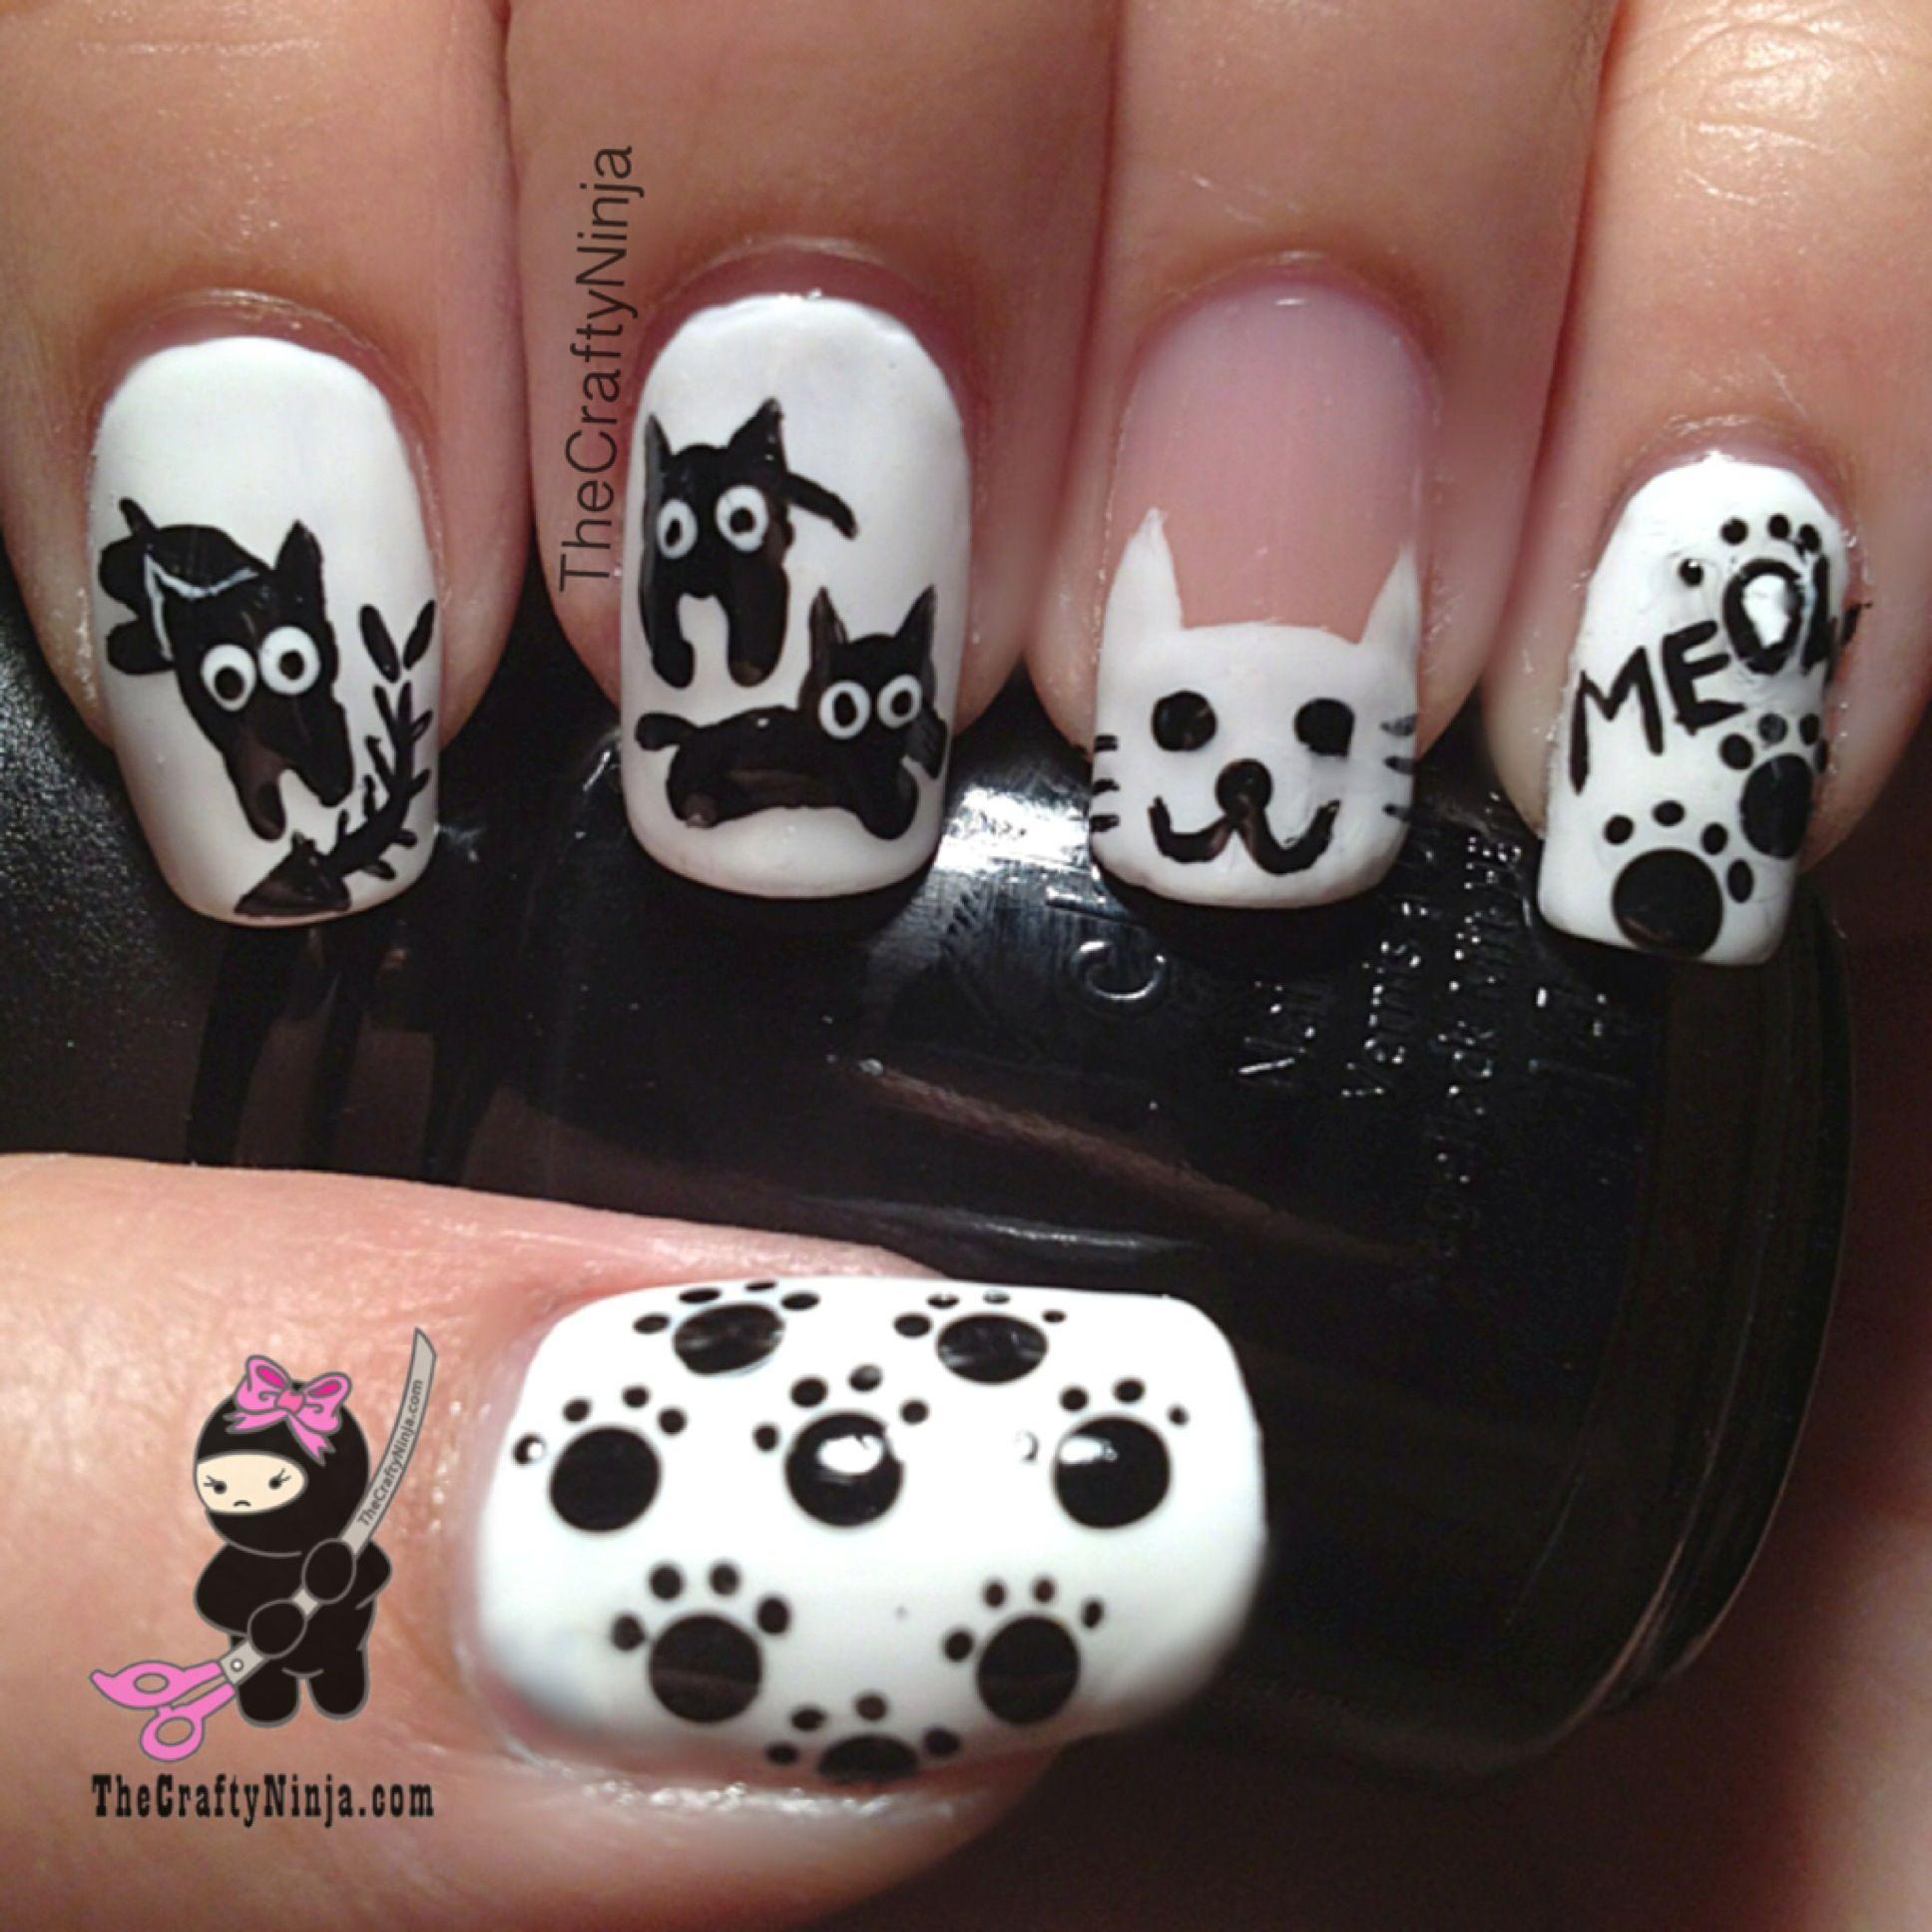 Kitty Cat Nails tutorial | TheCraftyNinja.com Nail Art | Pinterest ...